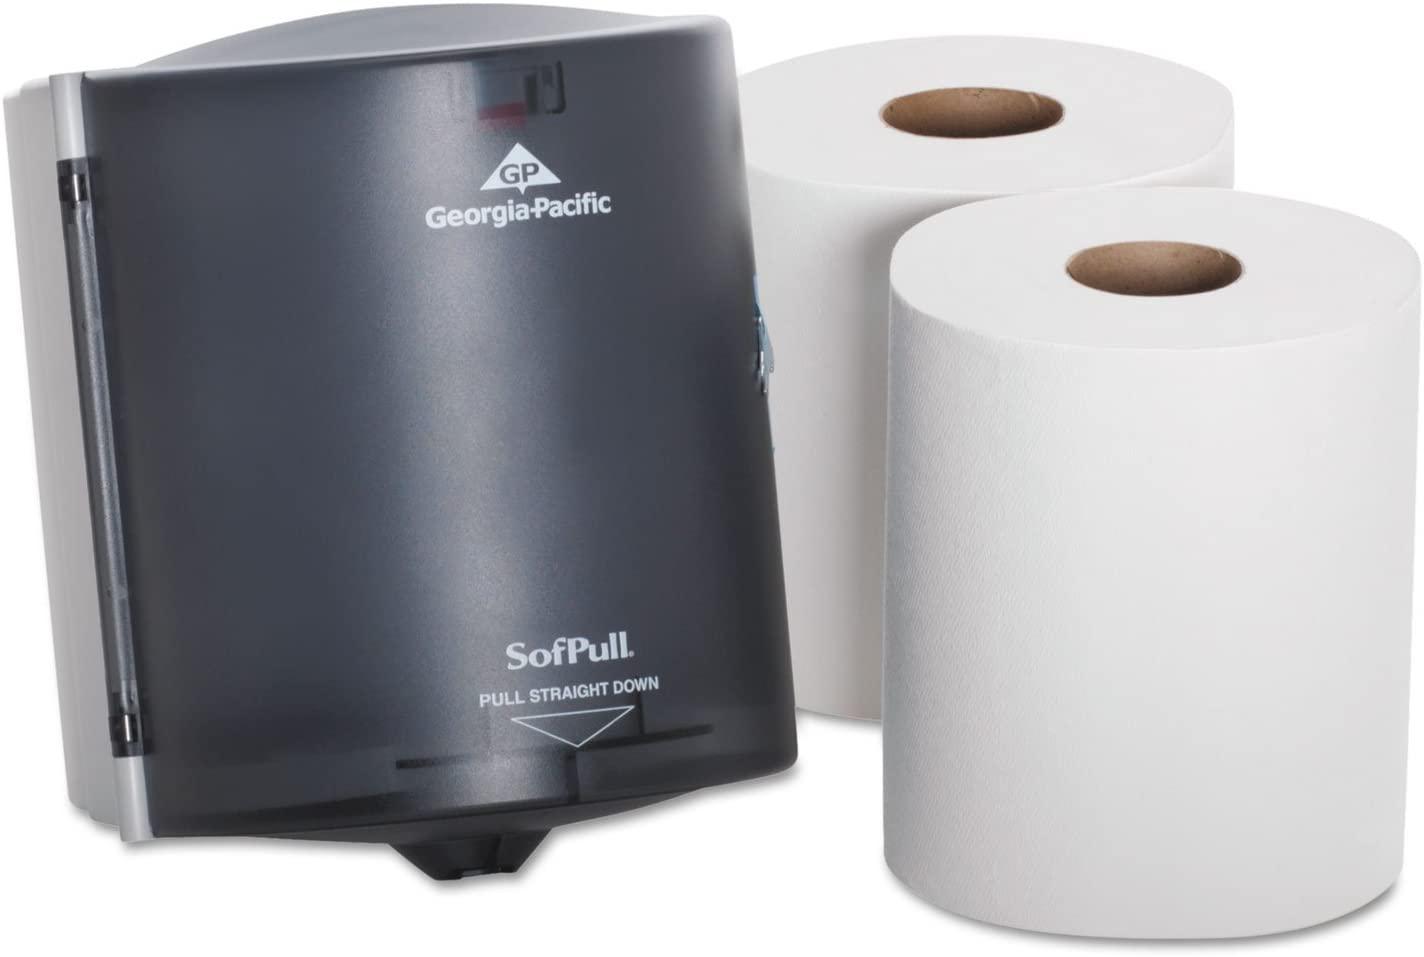 Trial Kit Dispenser 9 5/8 x 12 1/8 x 9 3/8 Translucent Smoke